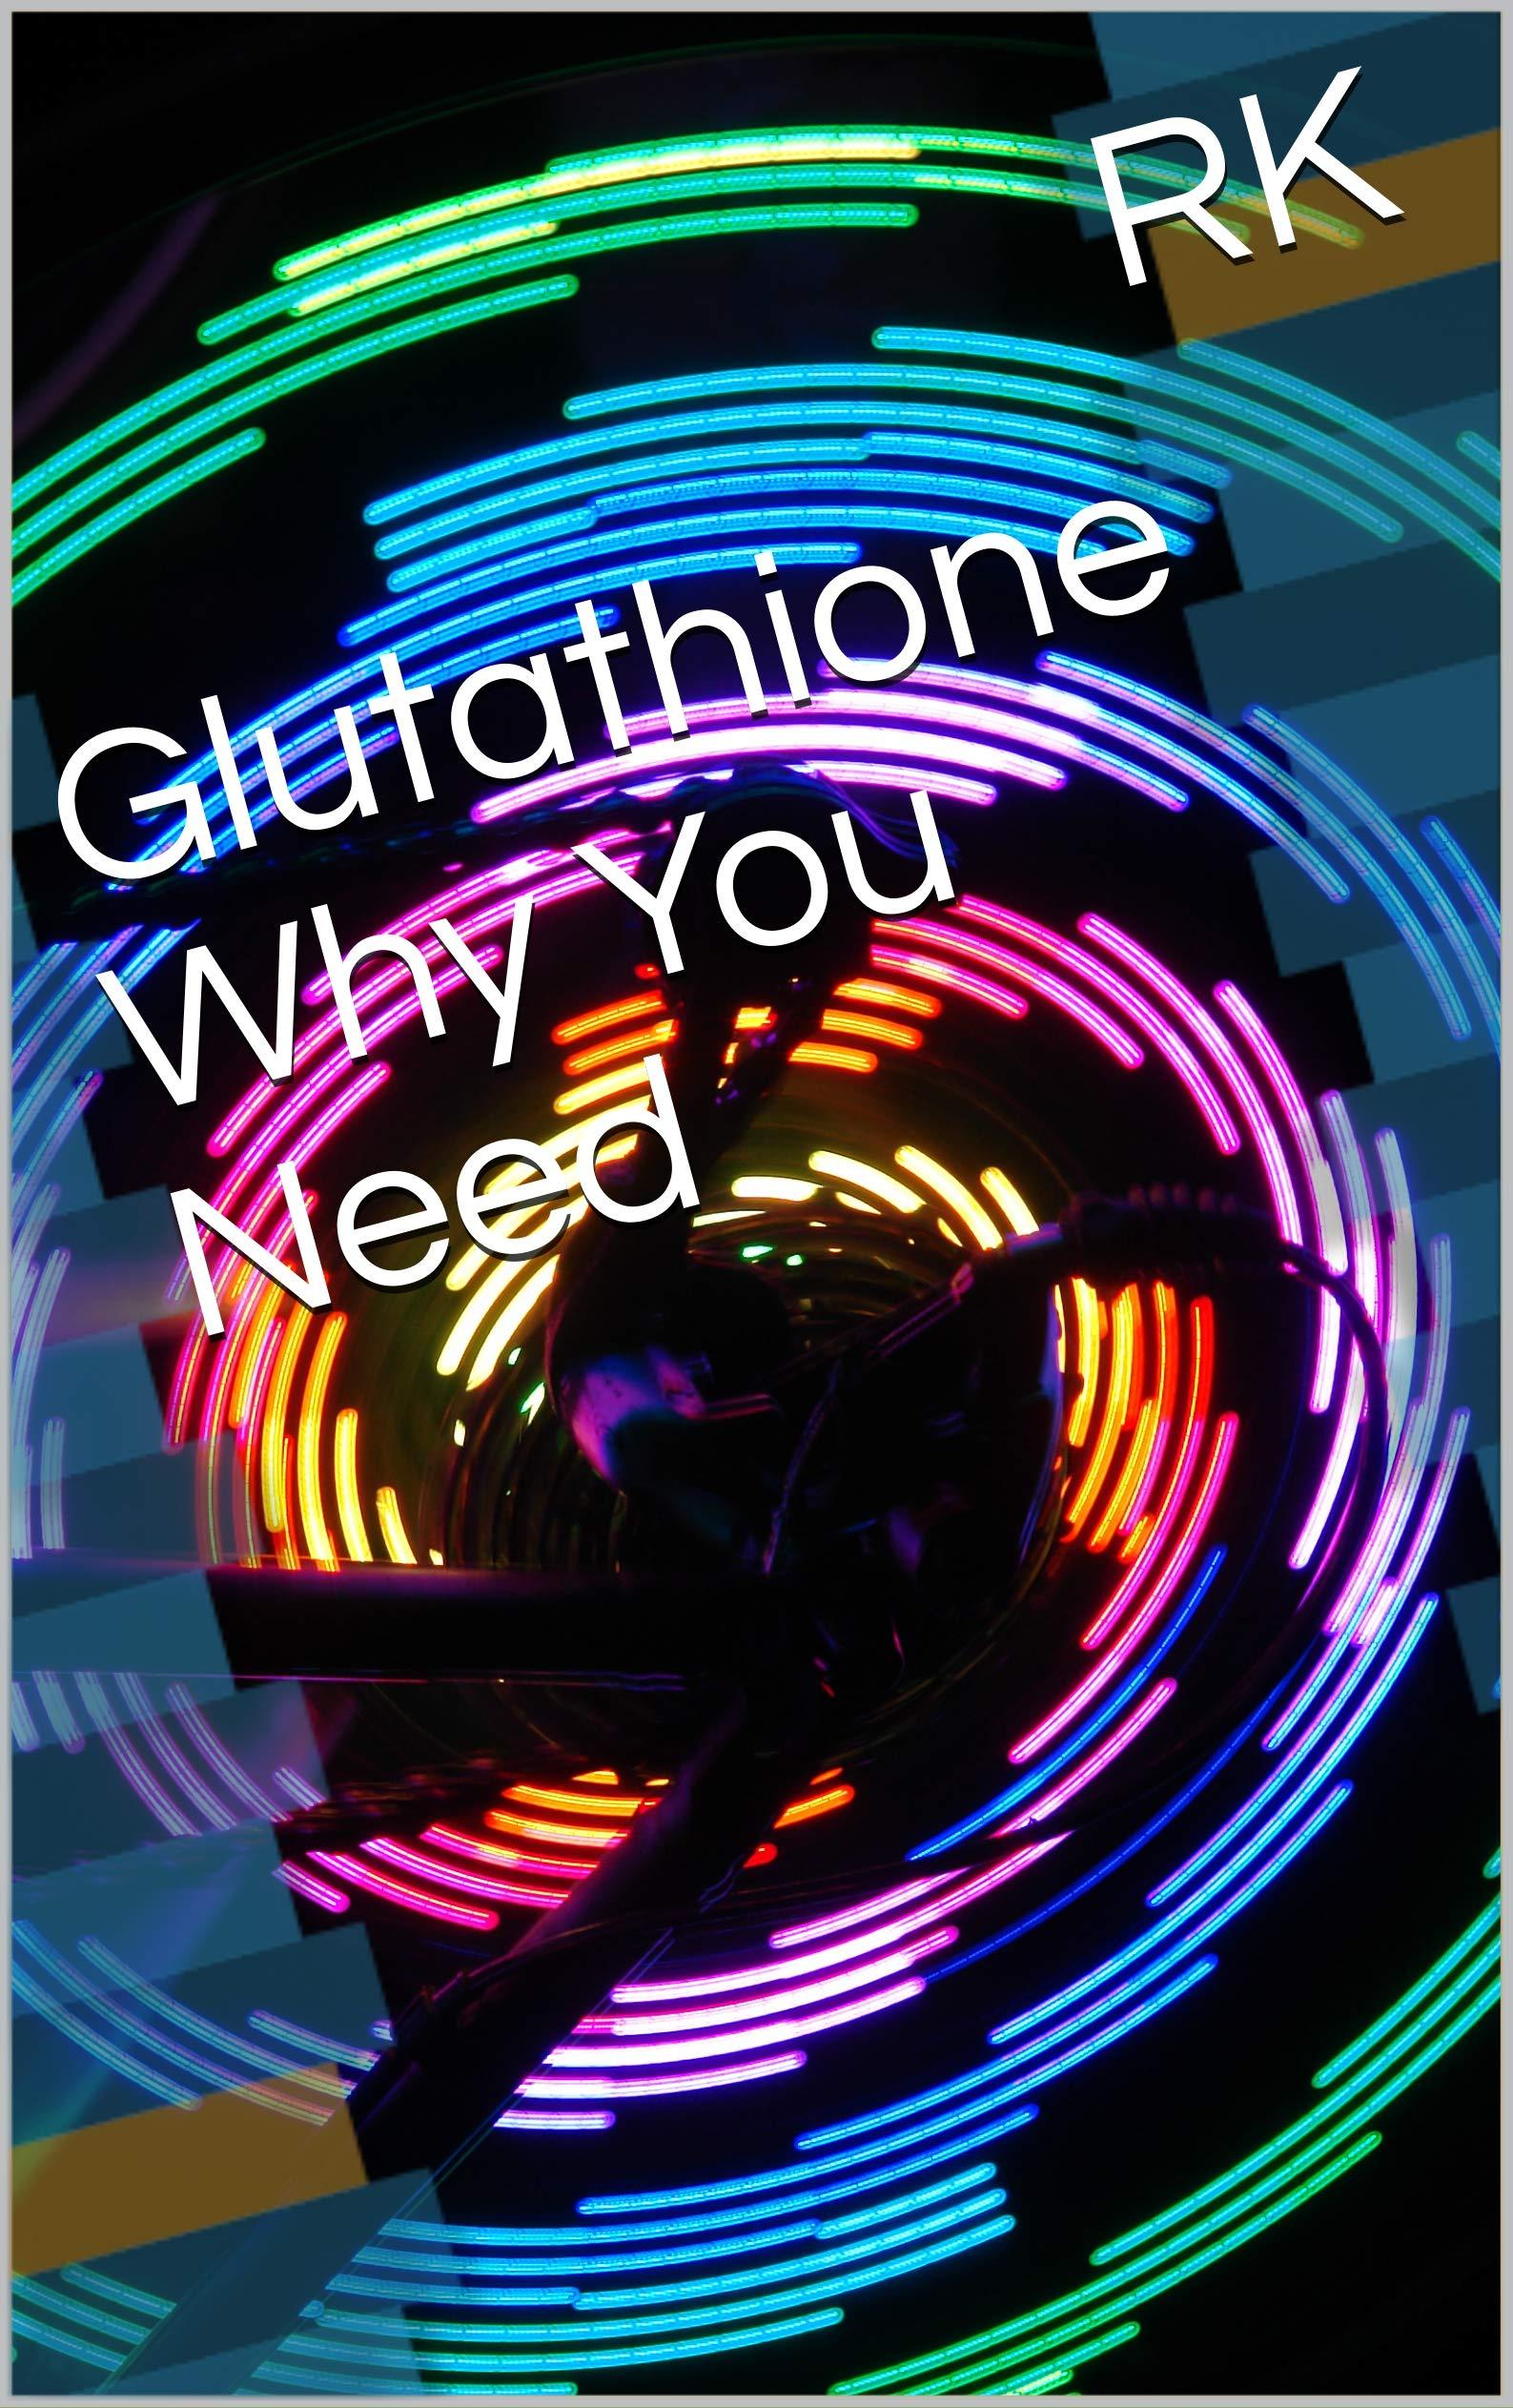 Need Gluthathione Explain Health Book ebook